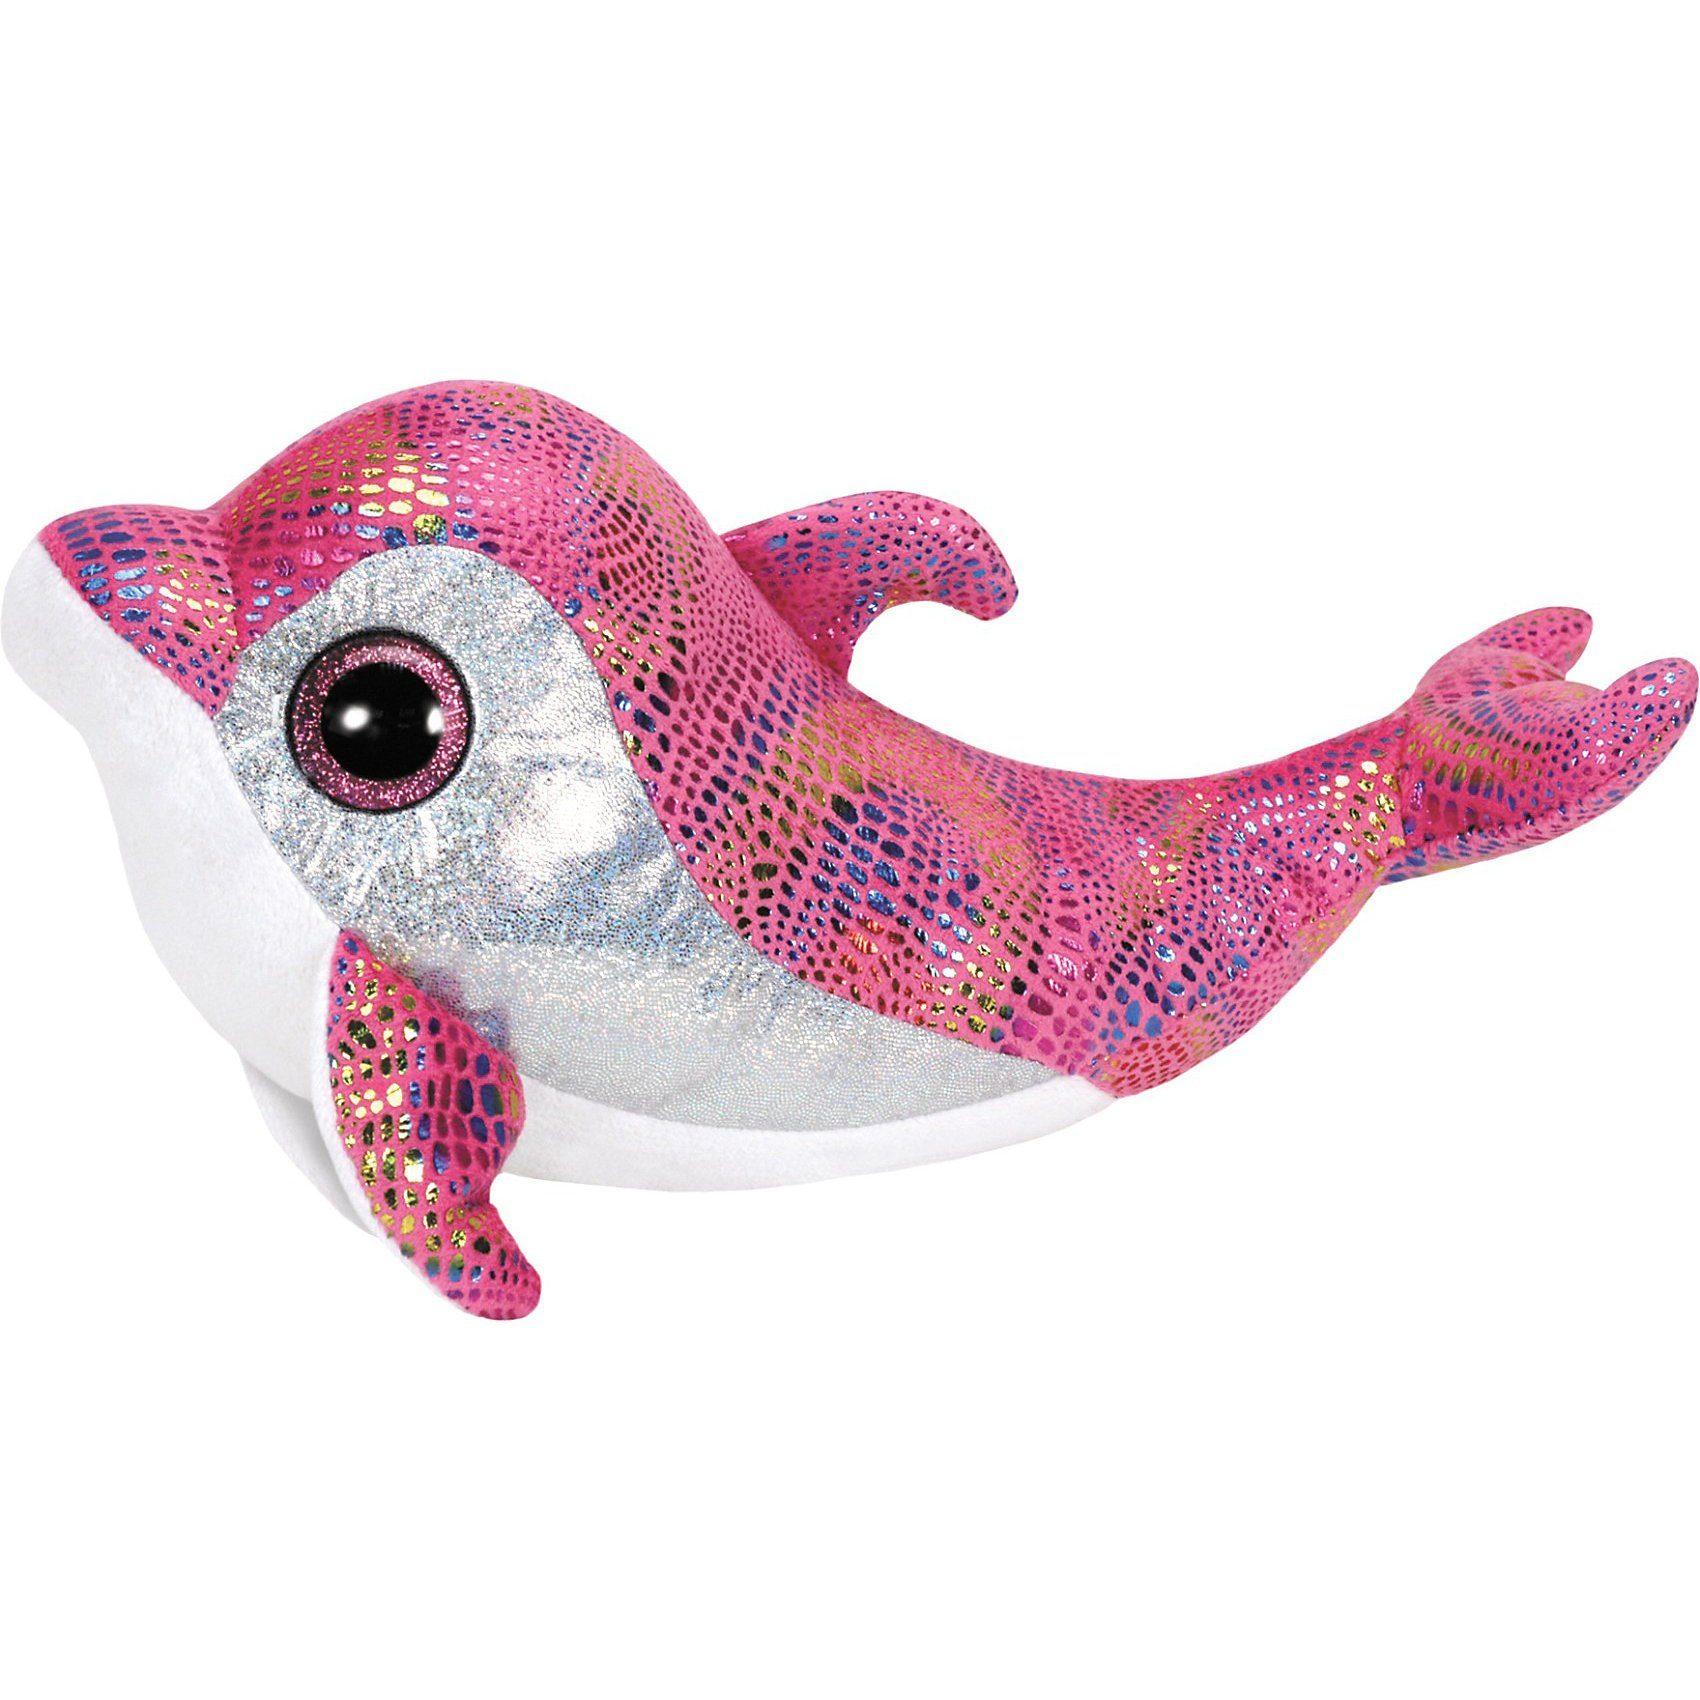 Ty® Beanie Boo Delfin Sparkles Buddy, 24 cm